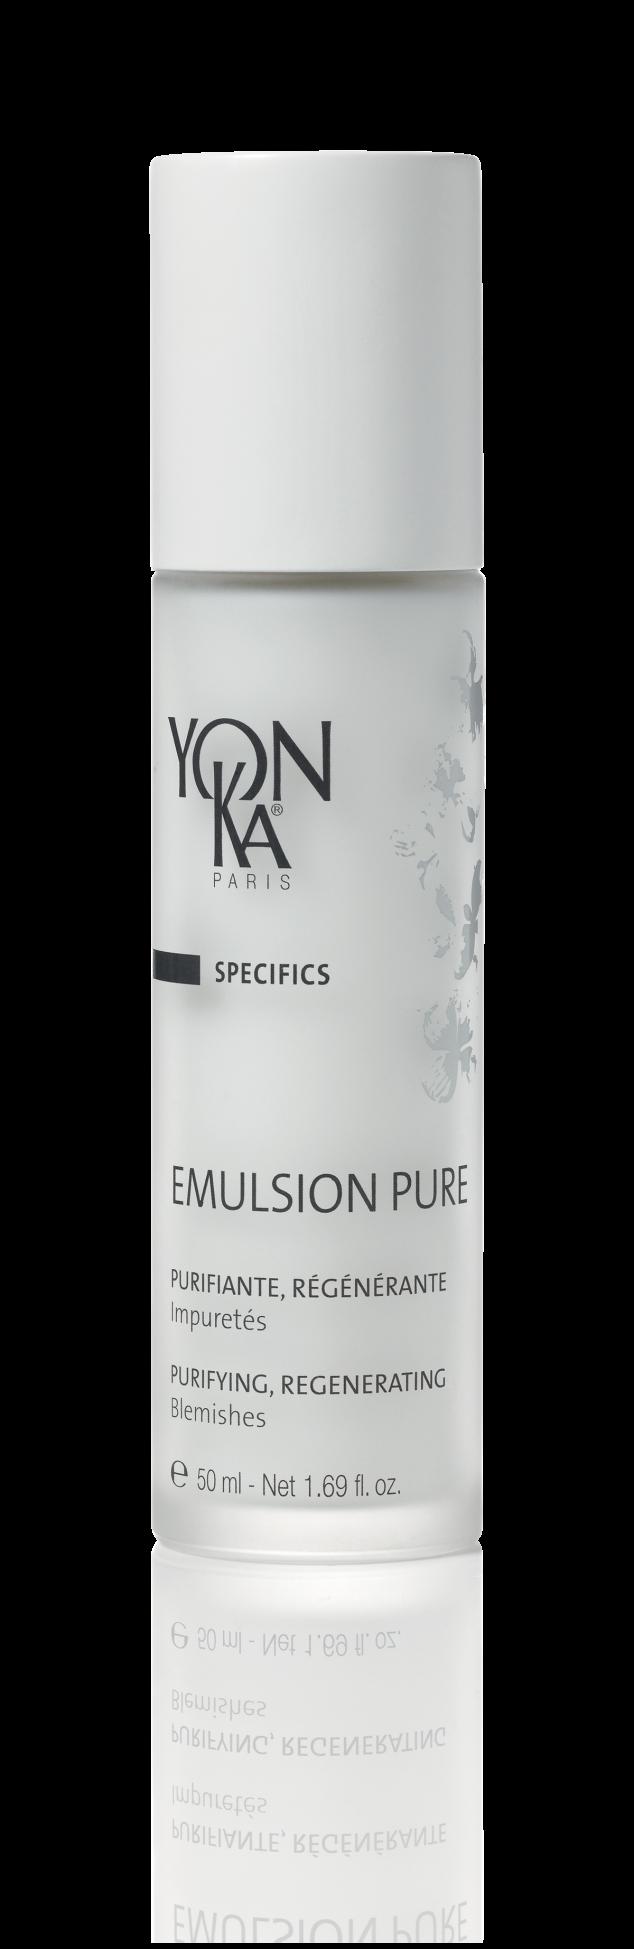 Emulsion Pure